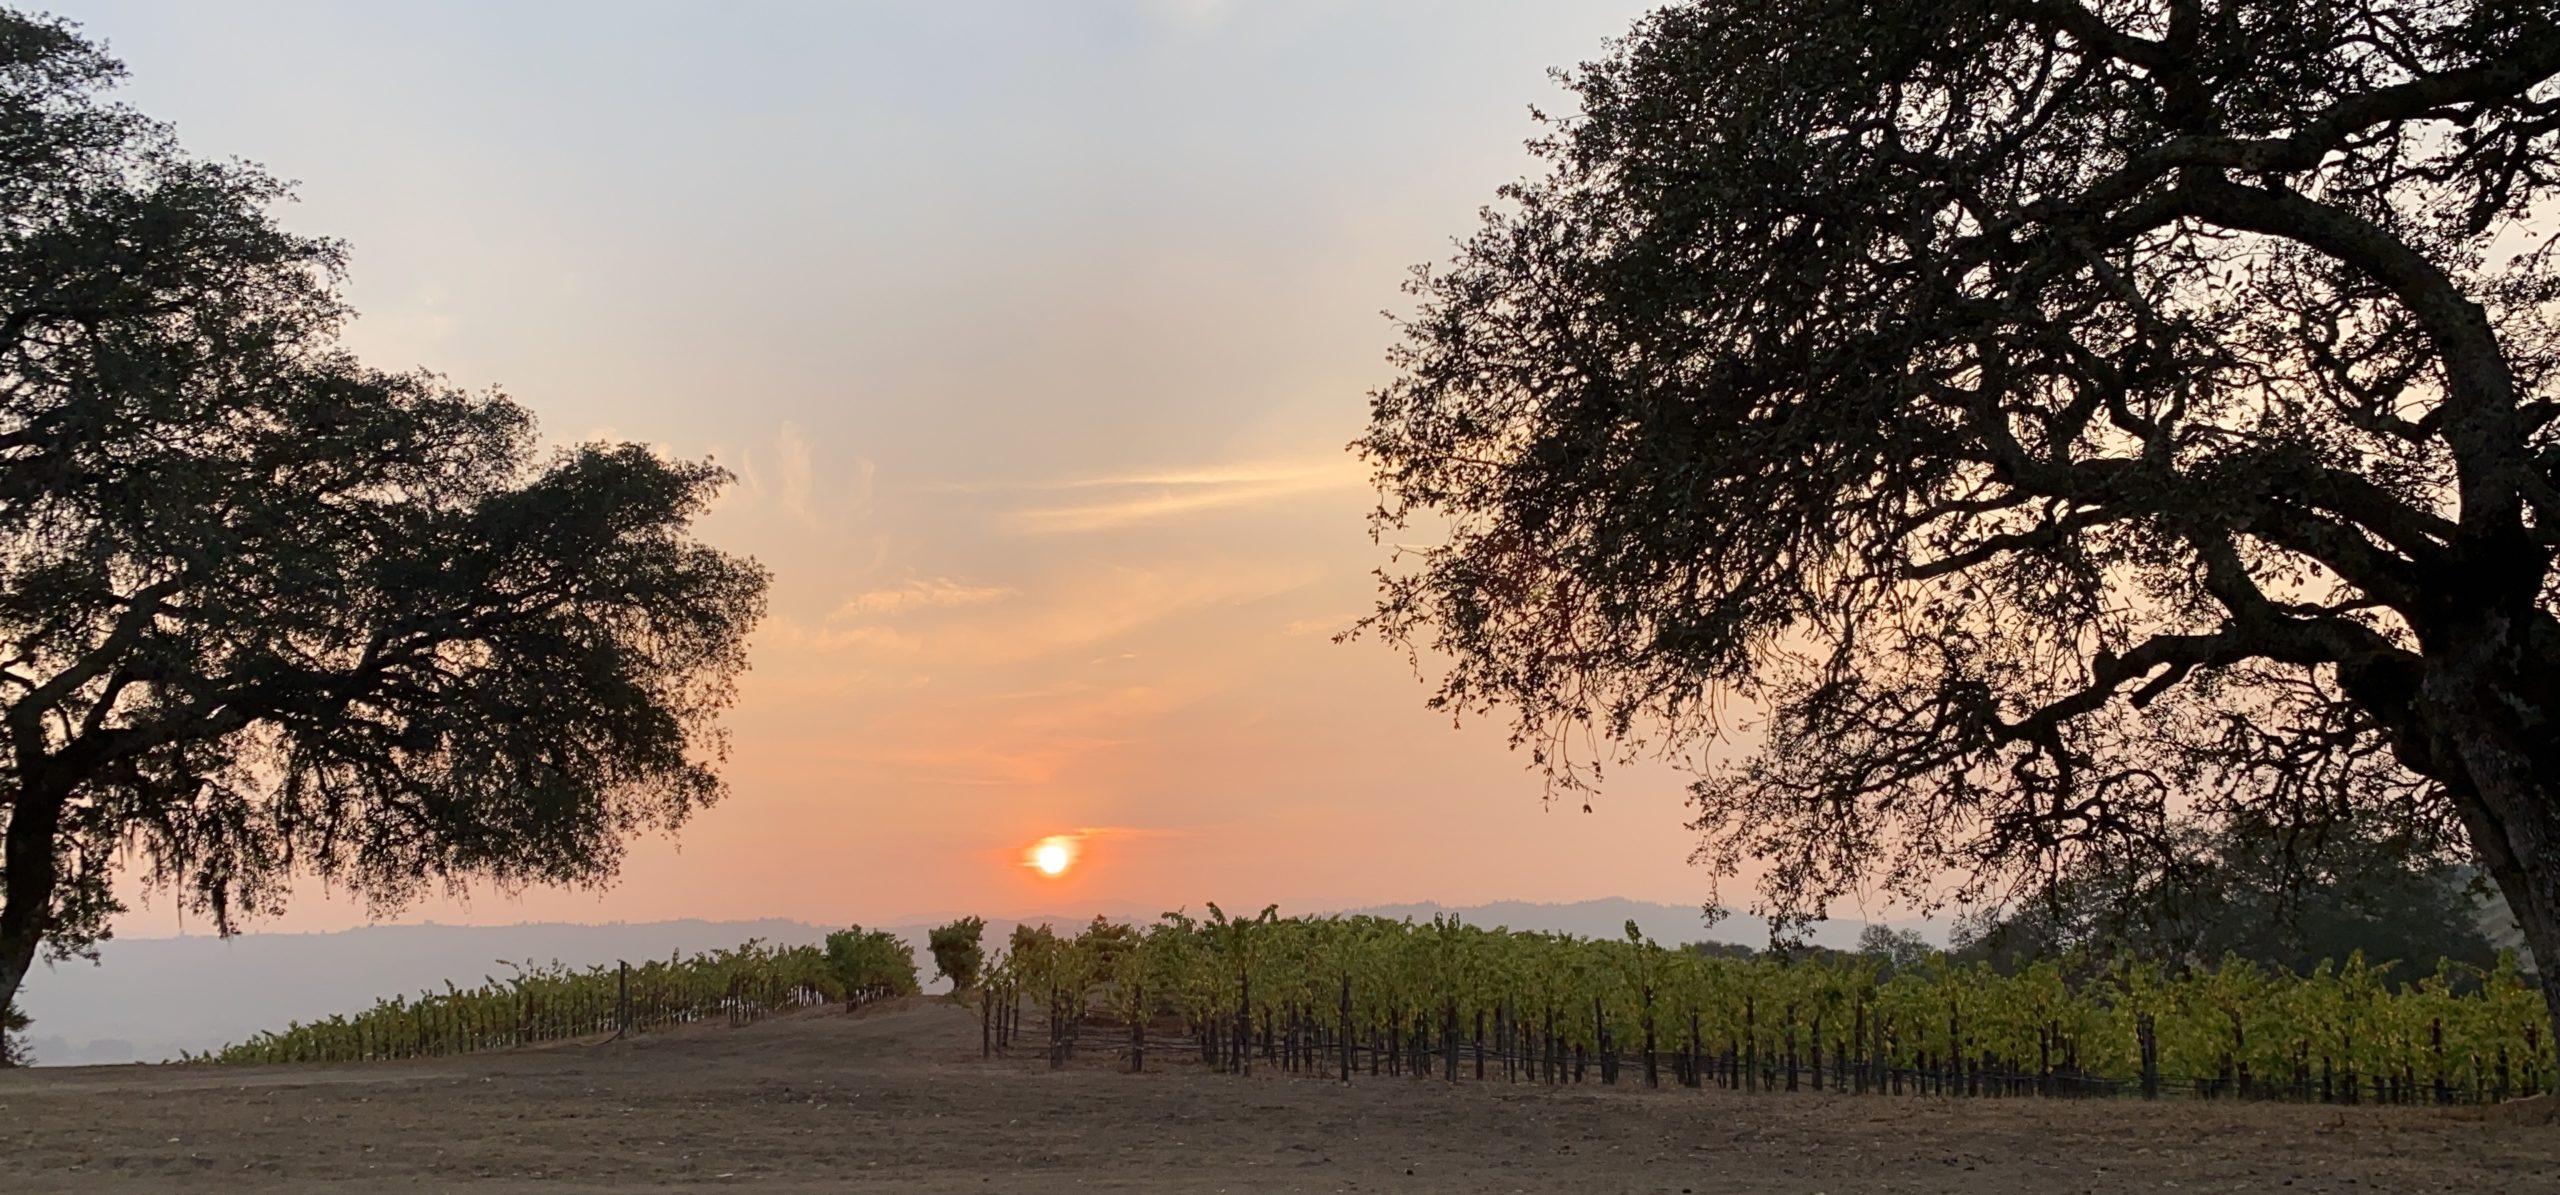 smoky sunset between 2 oak trees